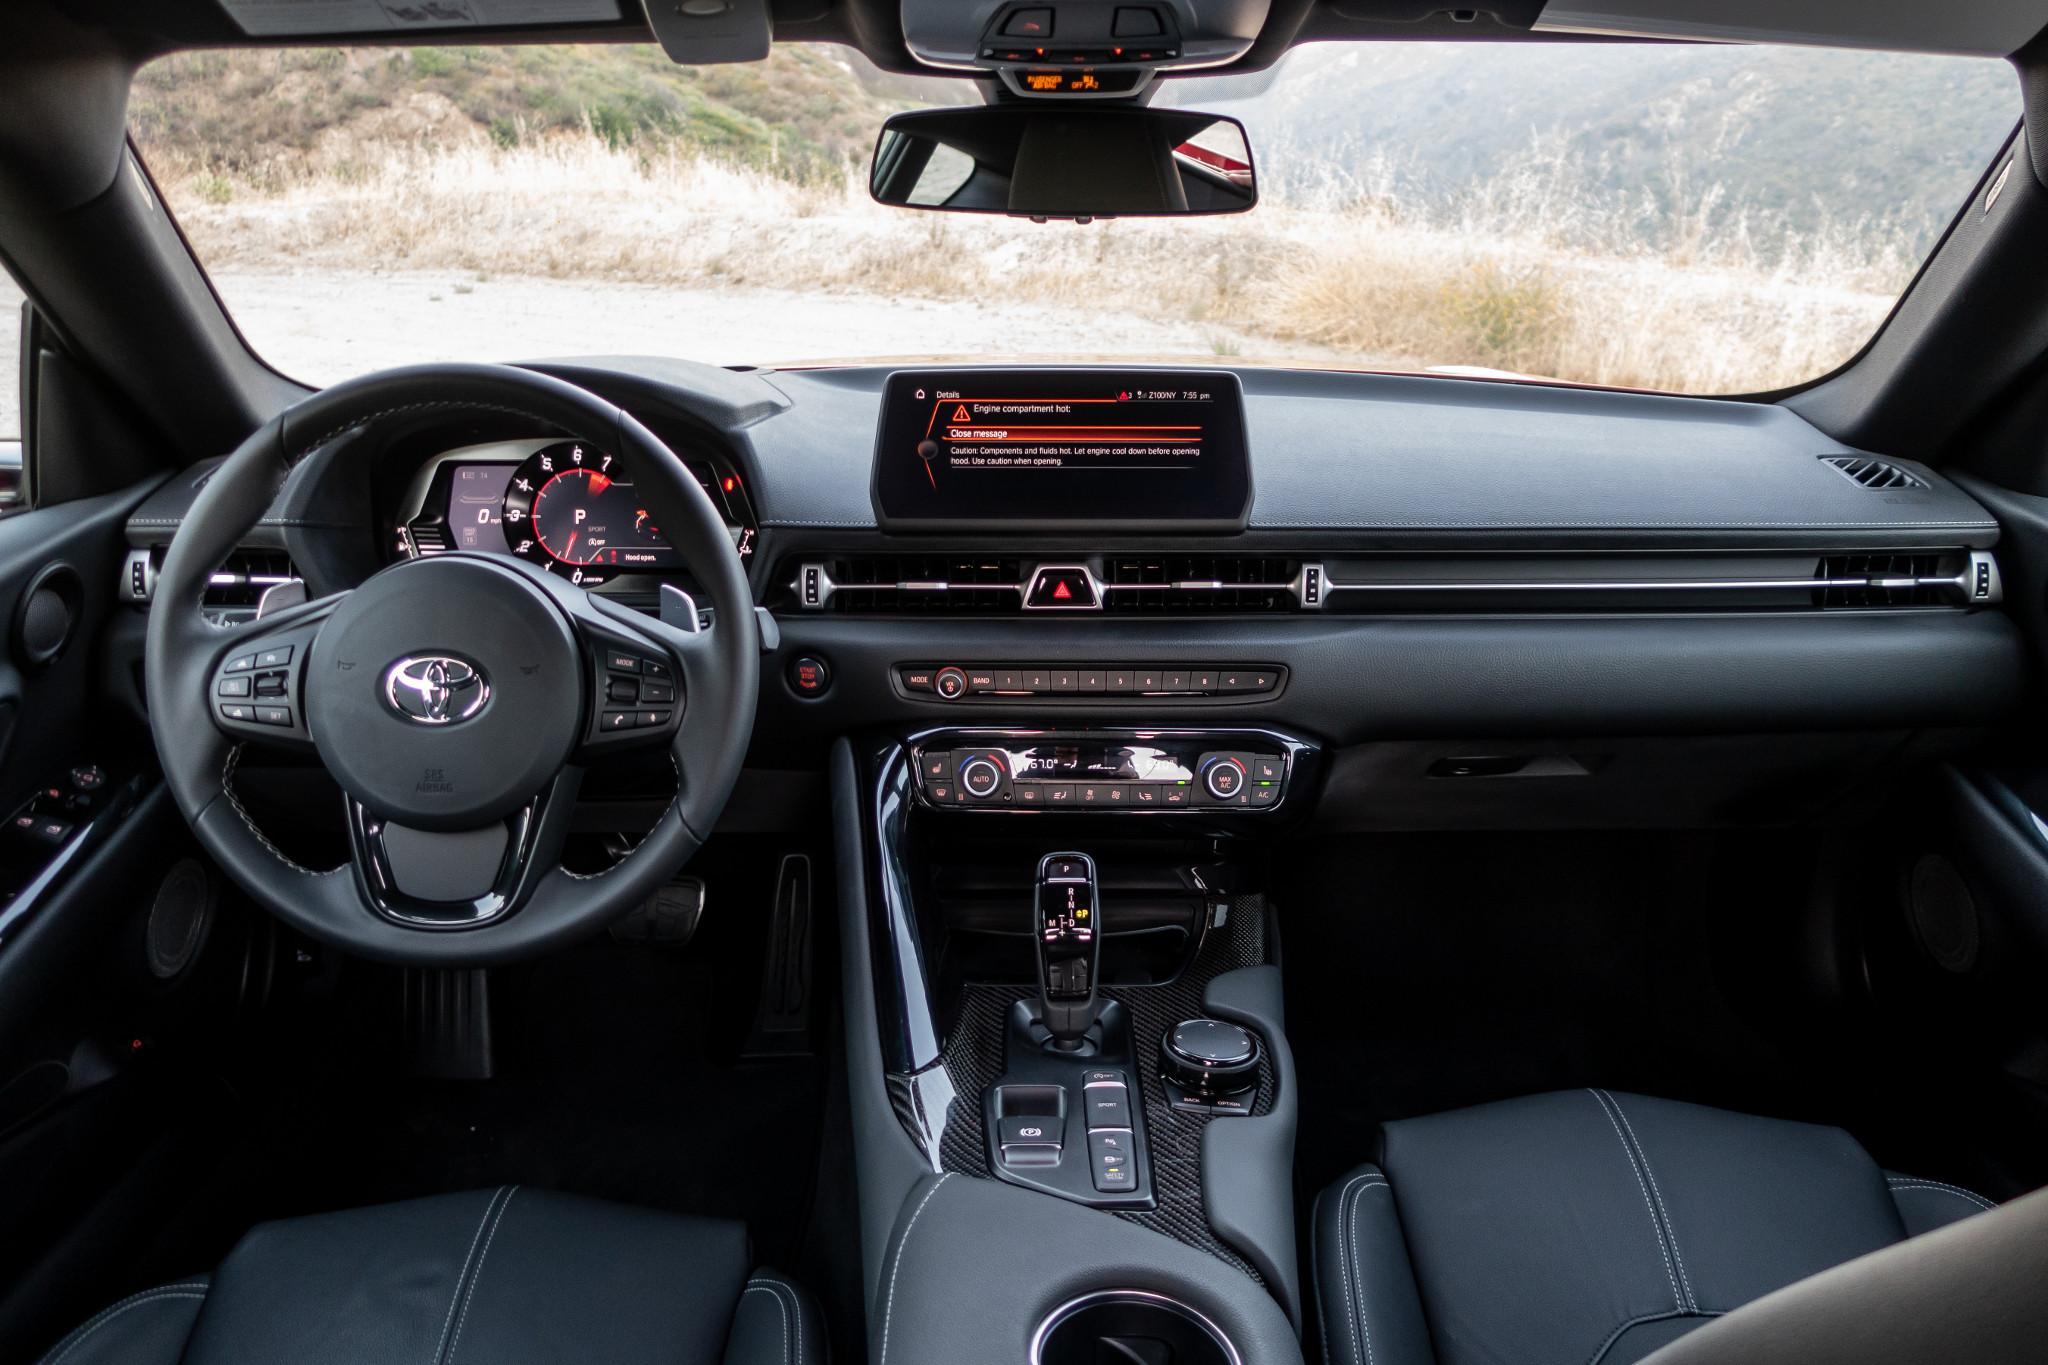 toyota-supra-2020-17-cockpit-shot--front-row--interior.jpg